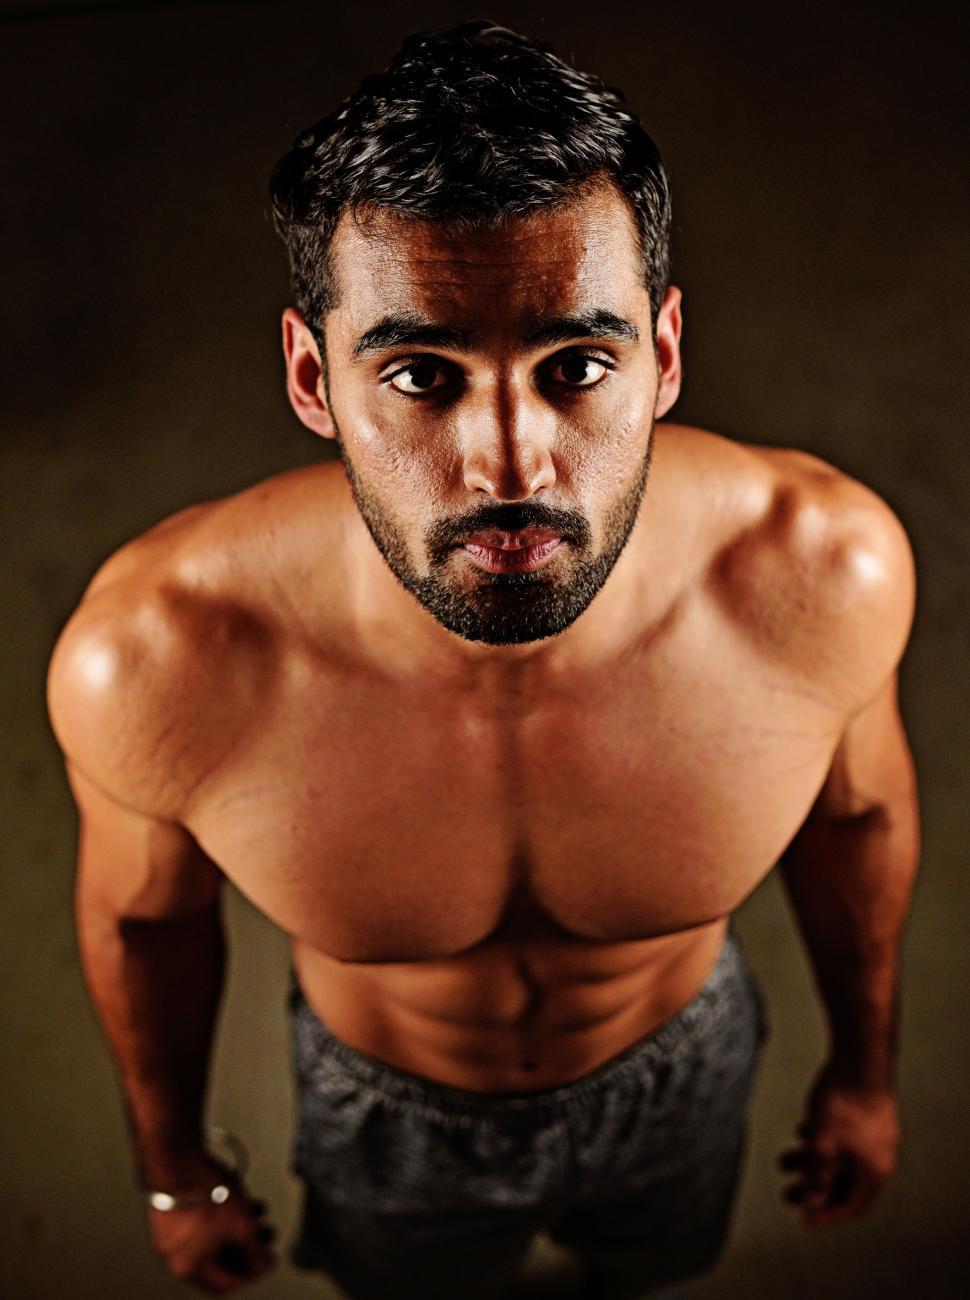 Download Free Stock Photo of Shirtless Indian Man in Gym - Eye Contact